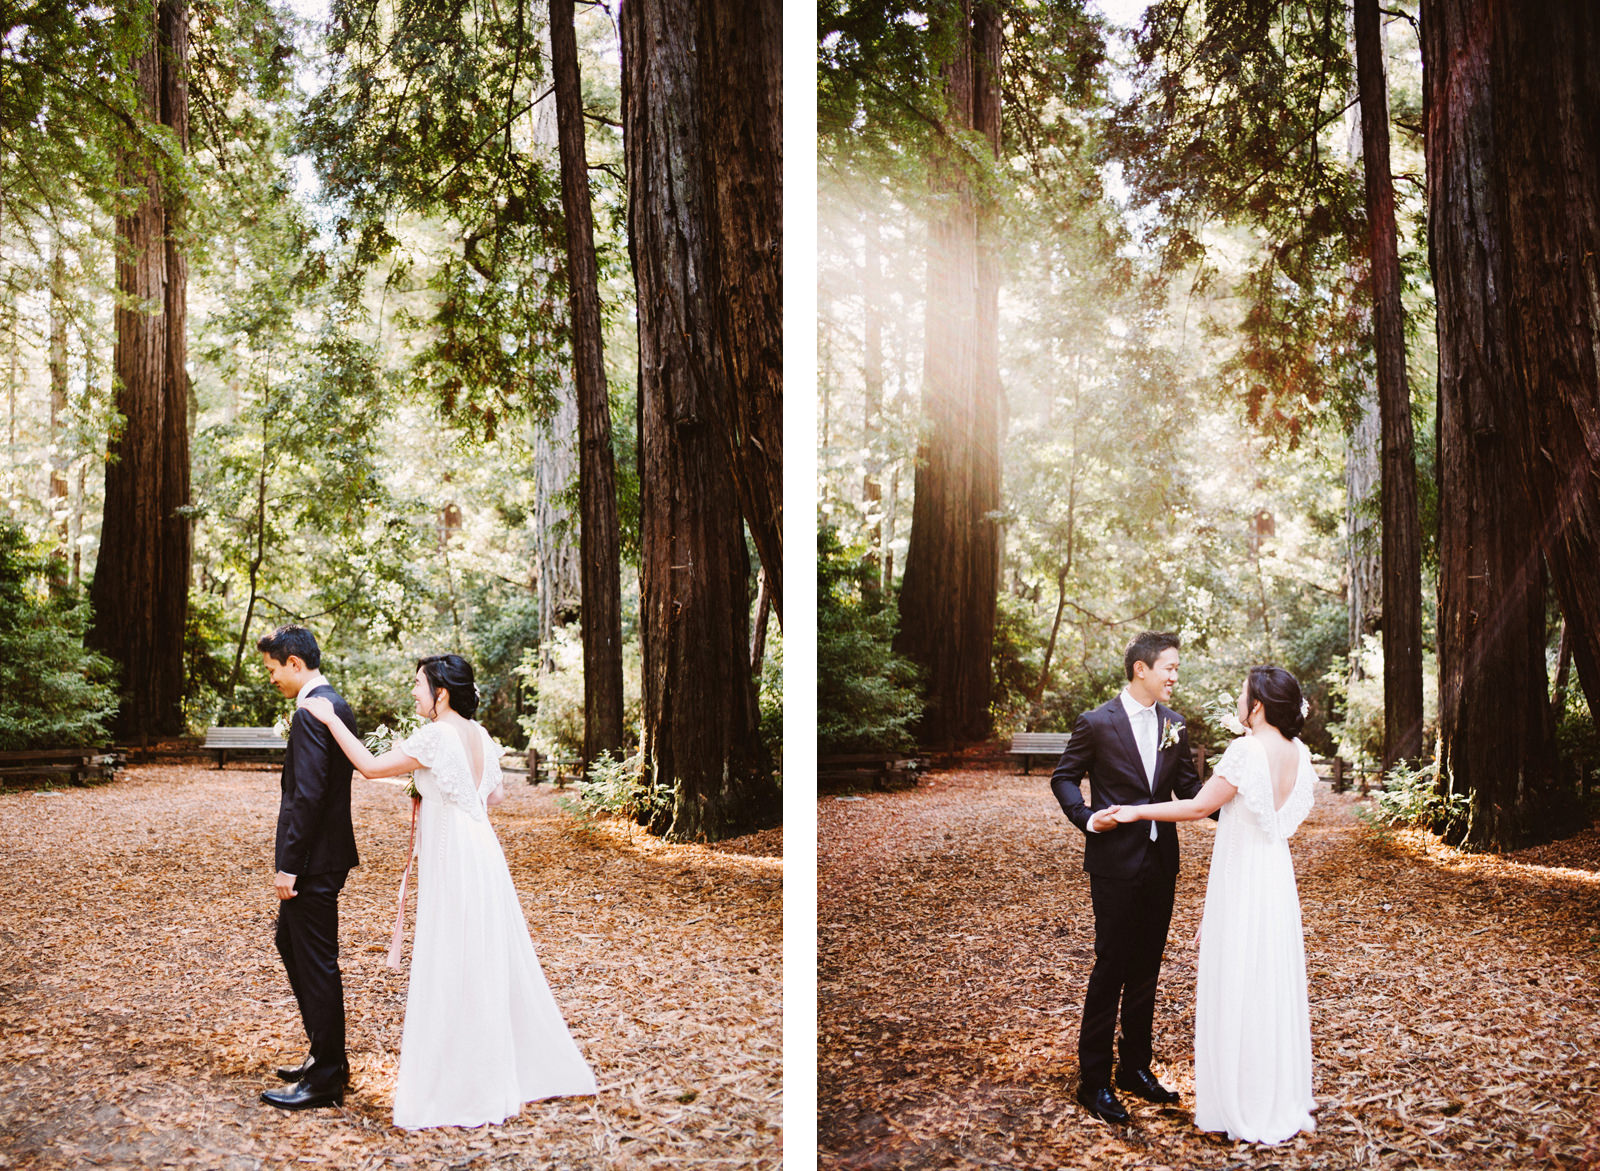 kimclay-blog-006 REDWOOD FOREST WEDDING